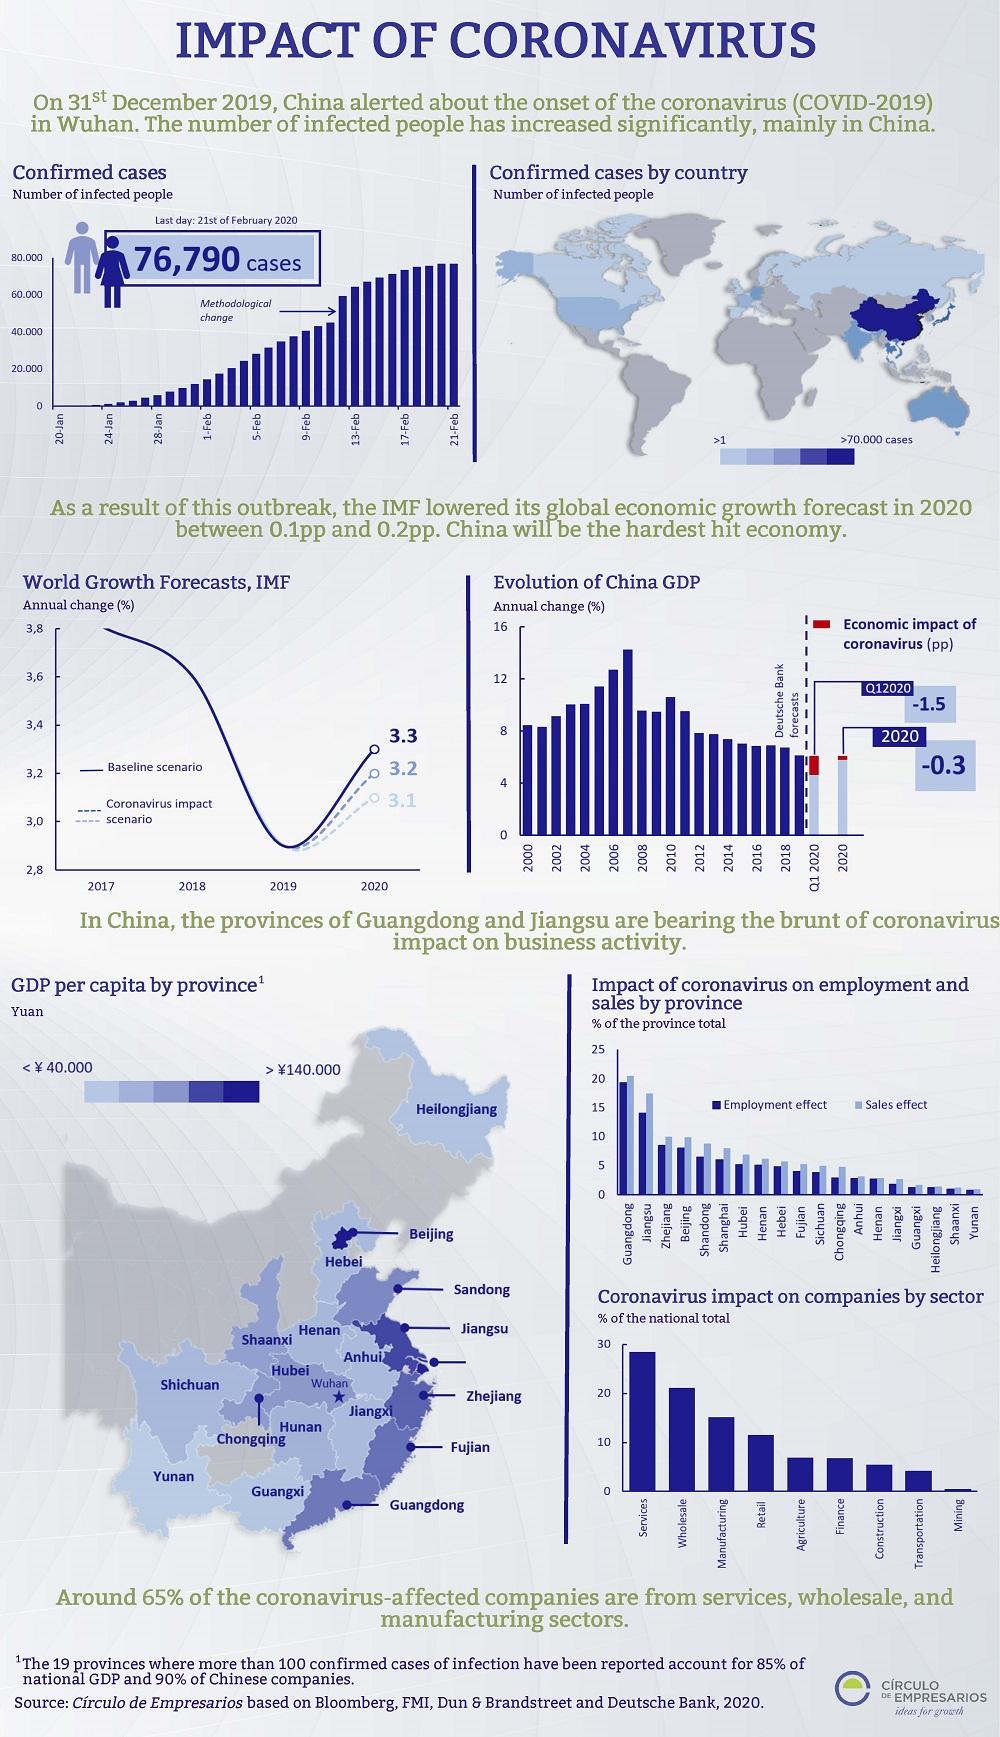 Impact-of-Coronavirus-Infographic-February-2020-Circulo-de-Empresarios